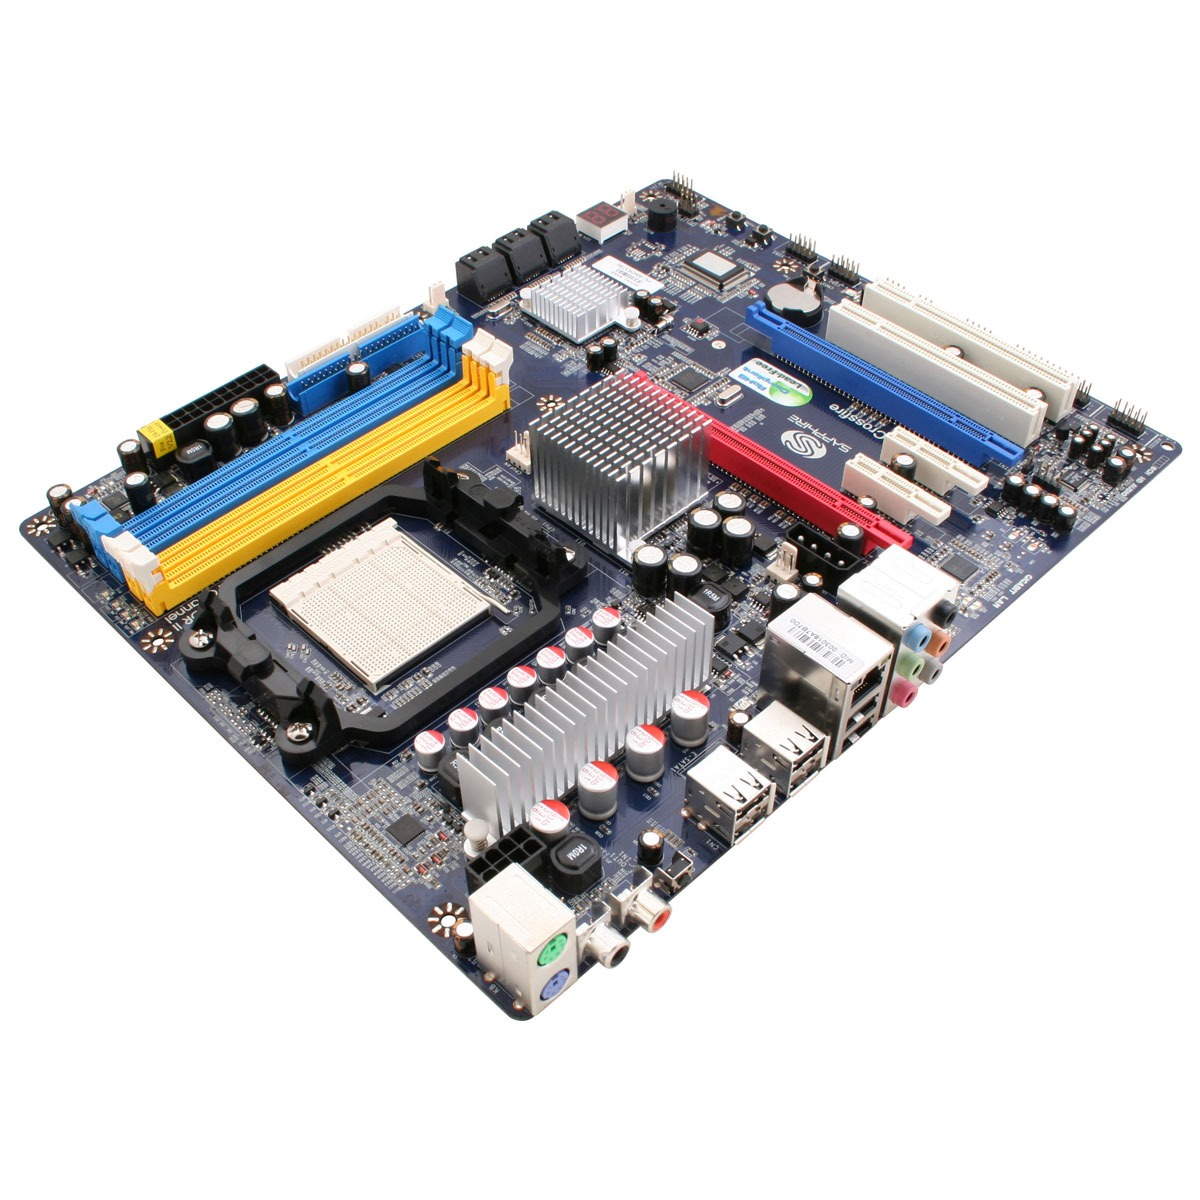 Sapphire PC-AM2RX790 64 Bit